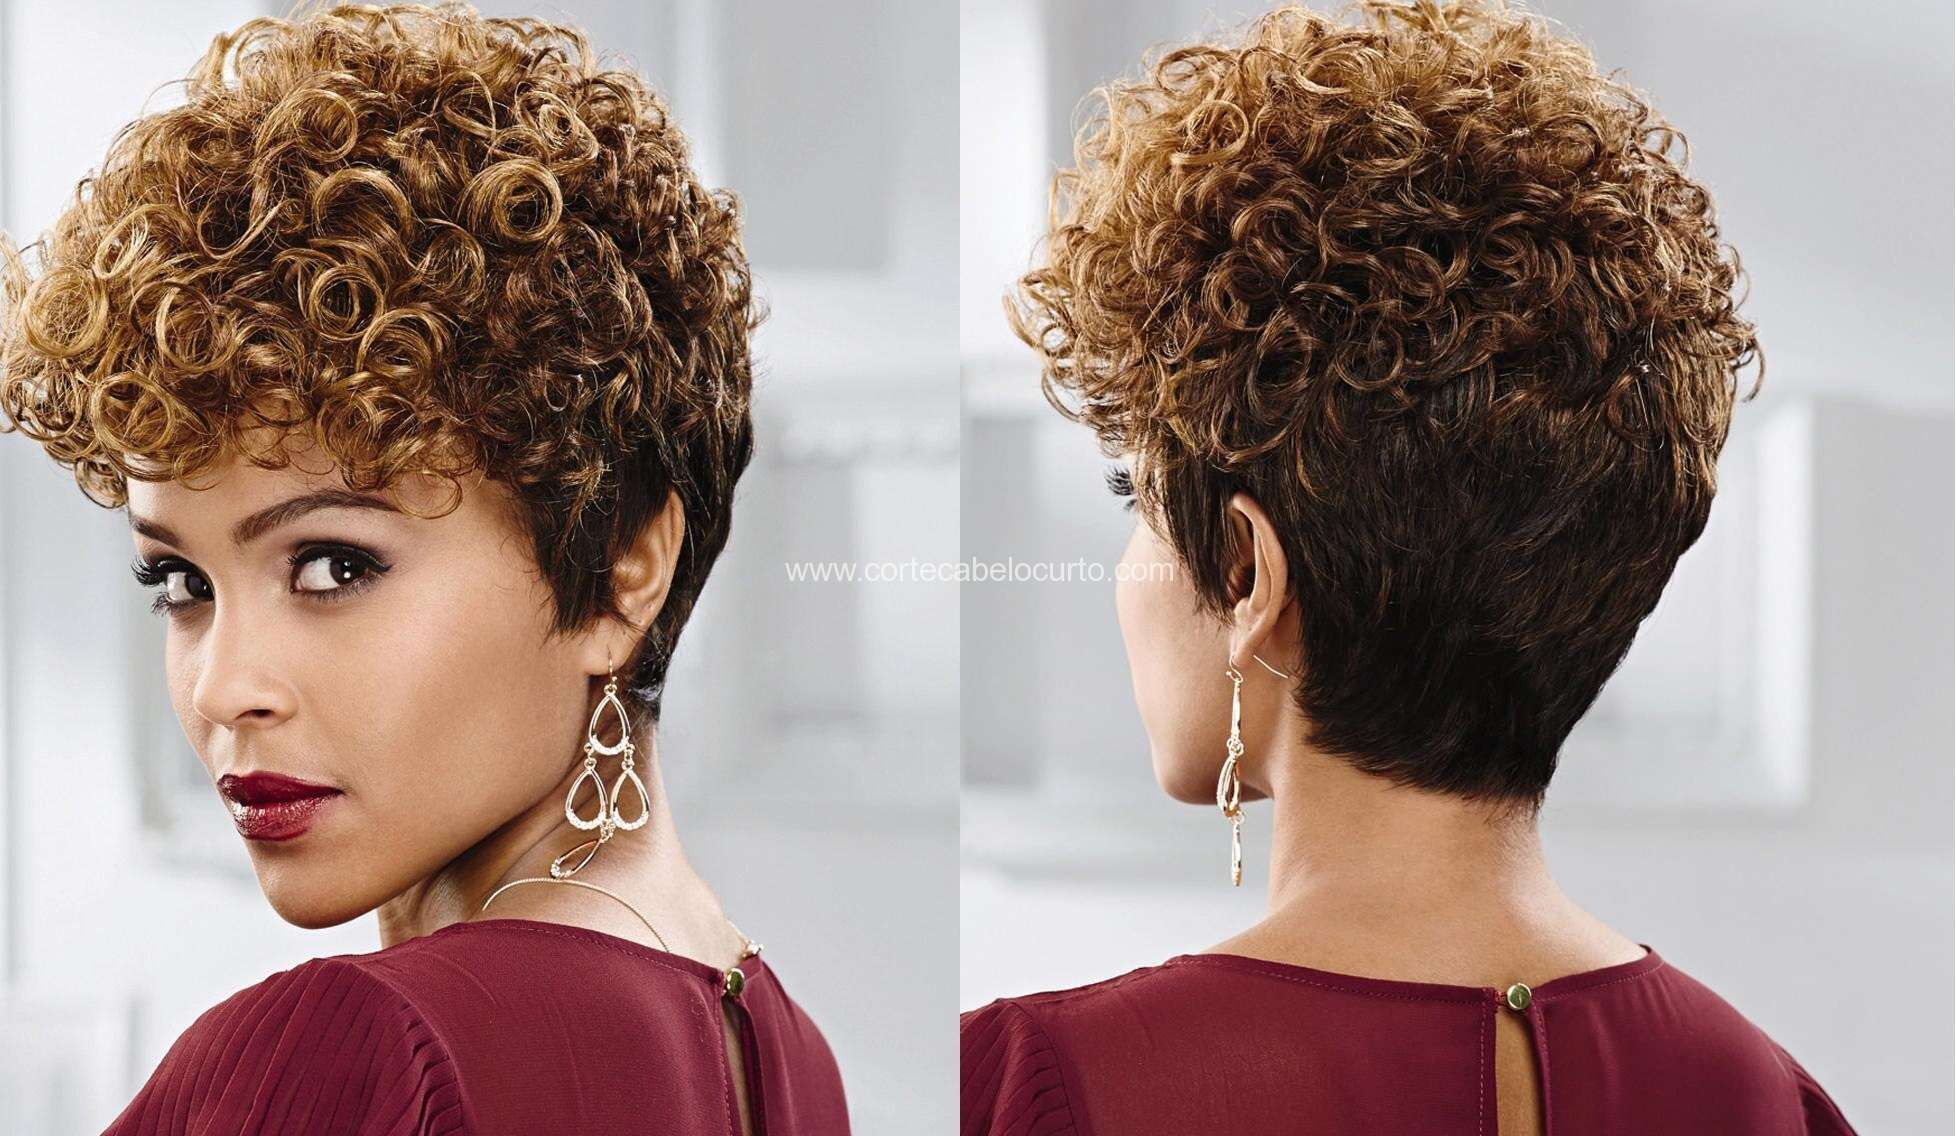 Pin Em Shorty Curly Cuts